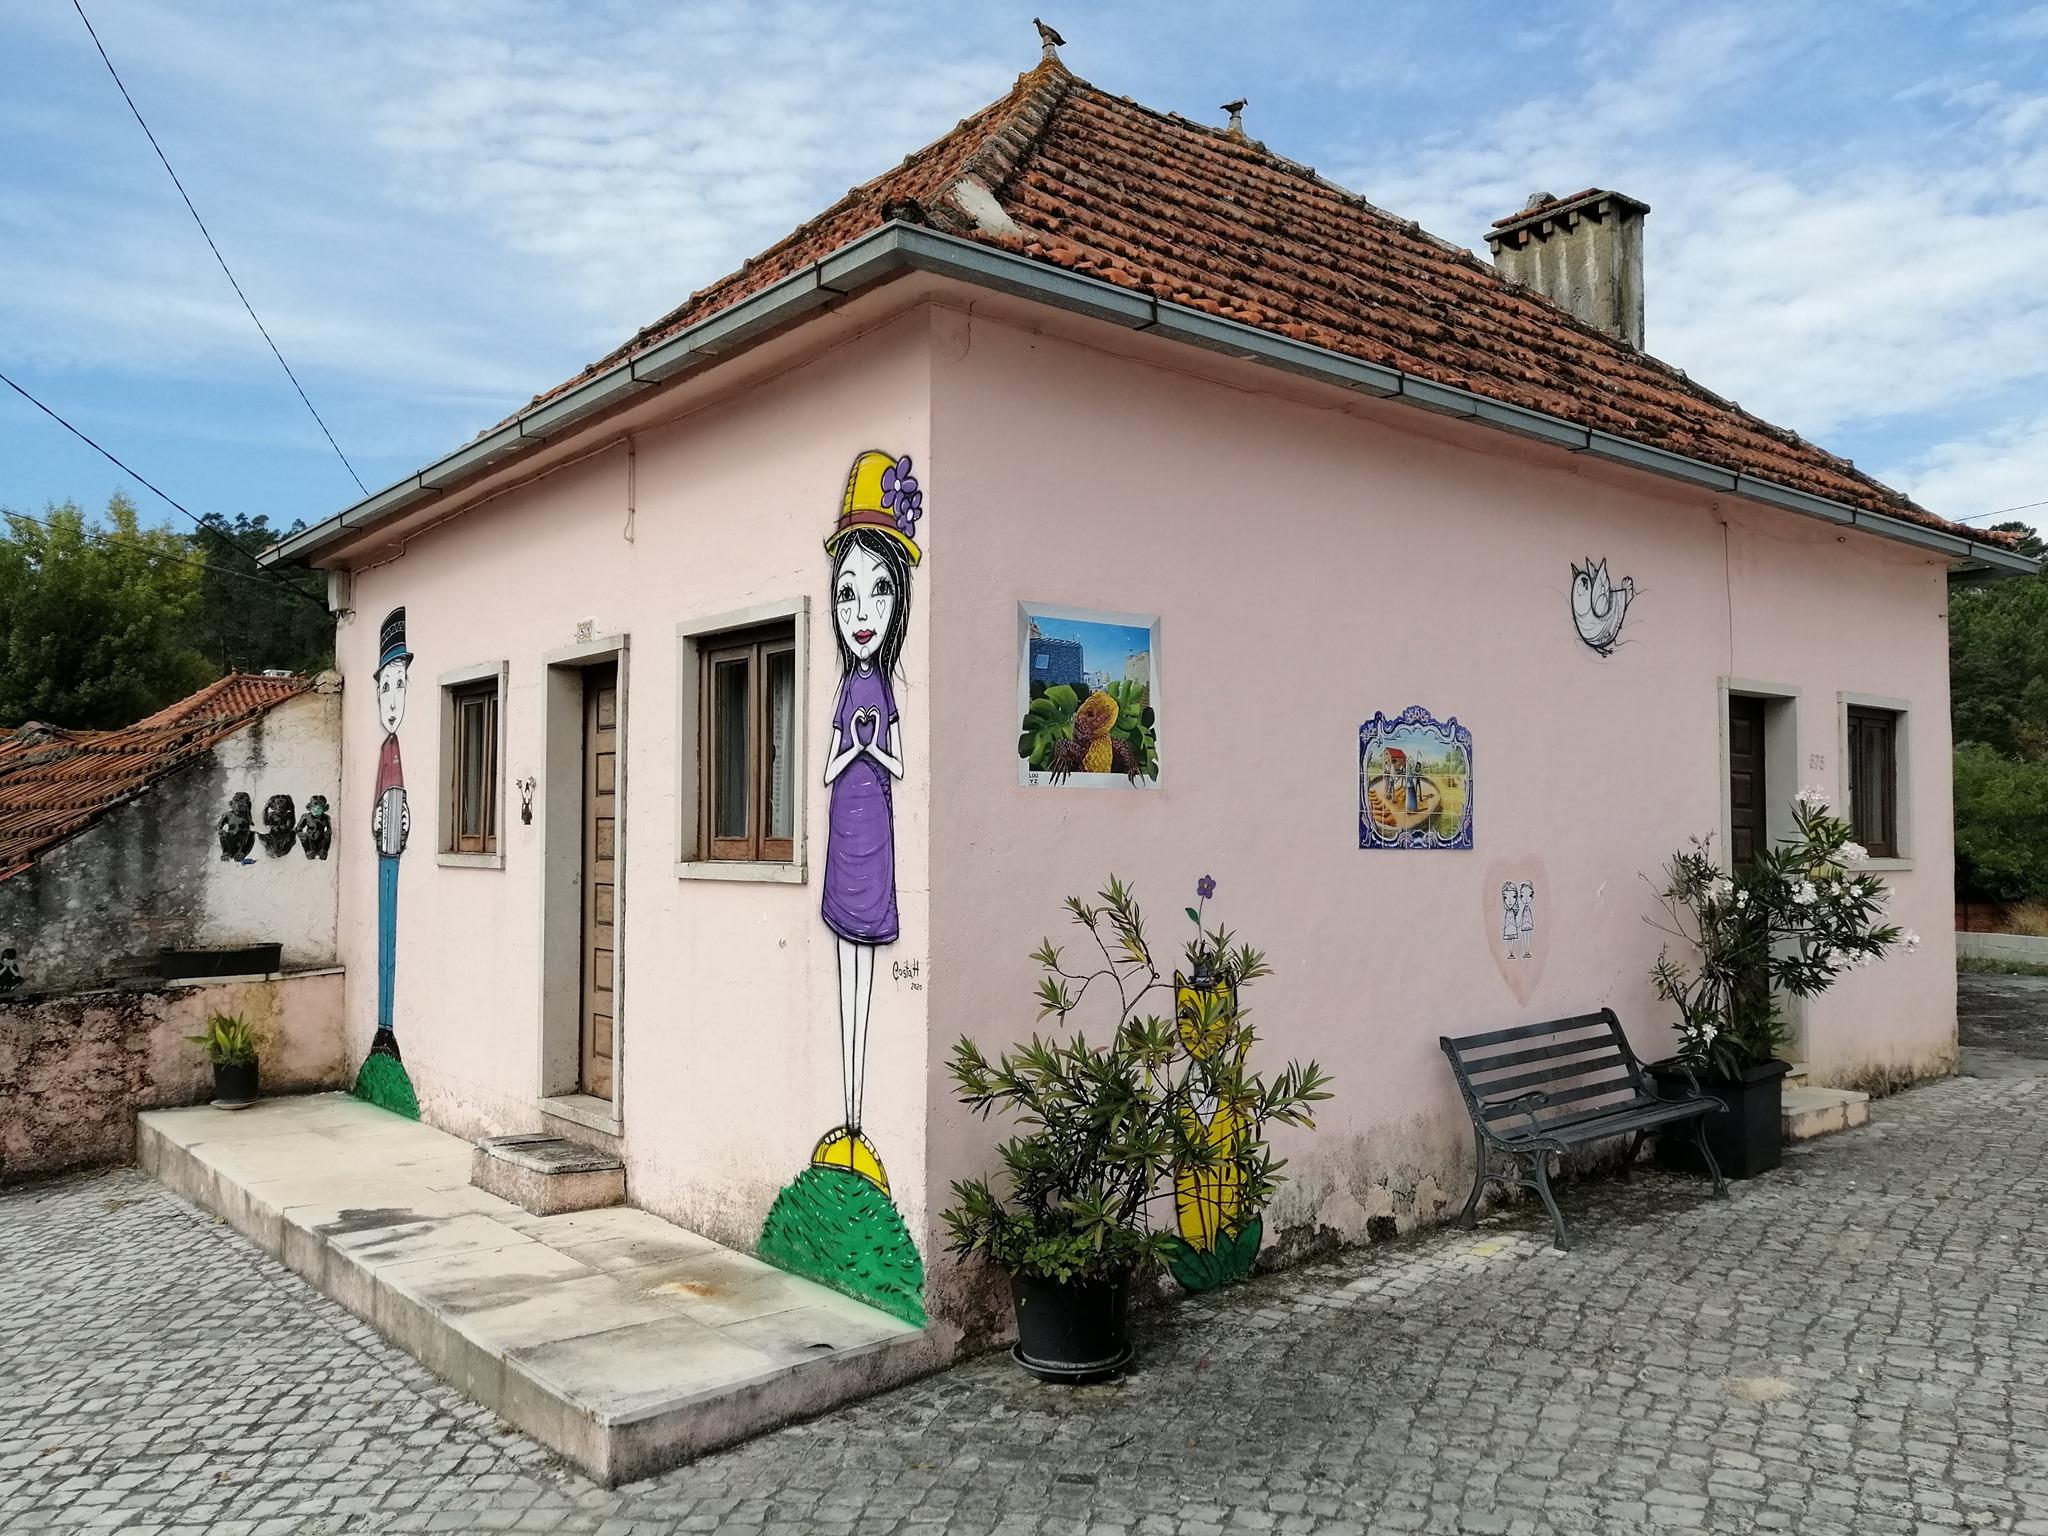 Mural pintado pelo artista portugês Costah / Facebook @Barrenta2480